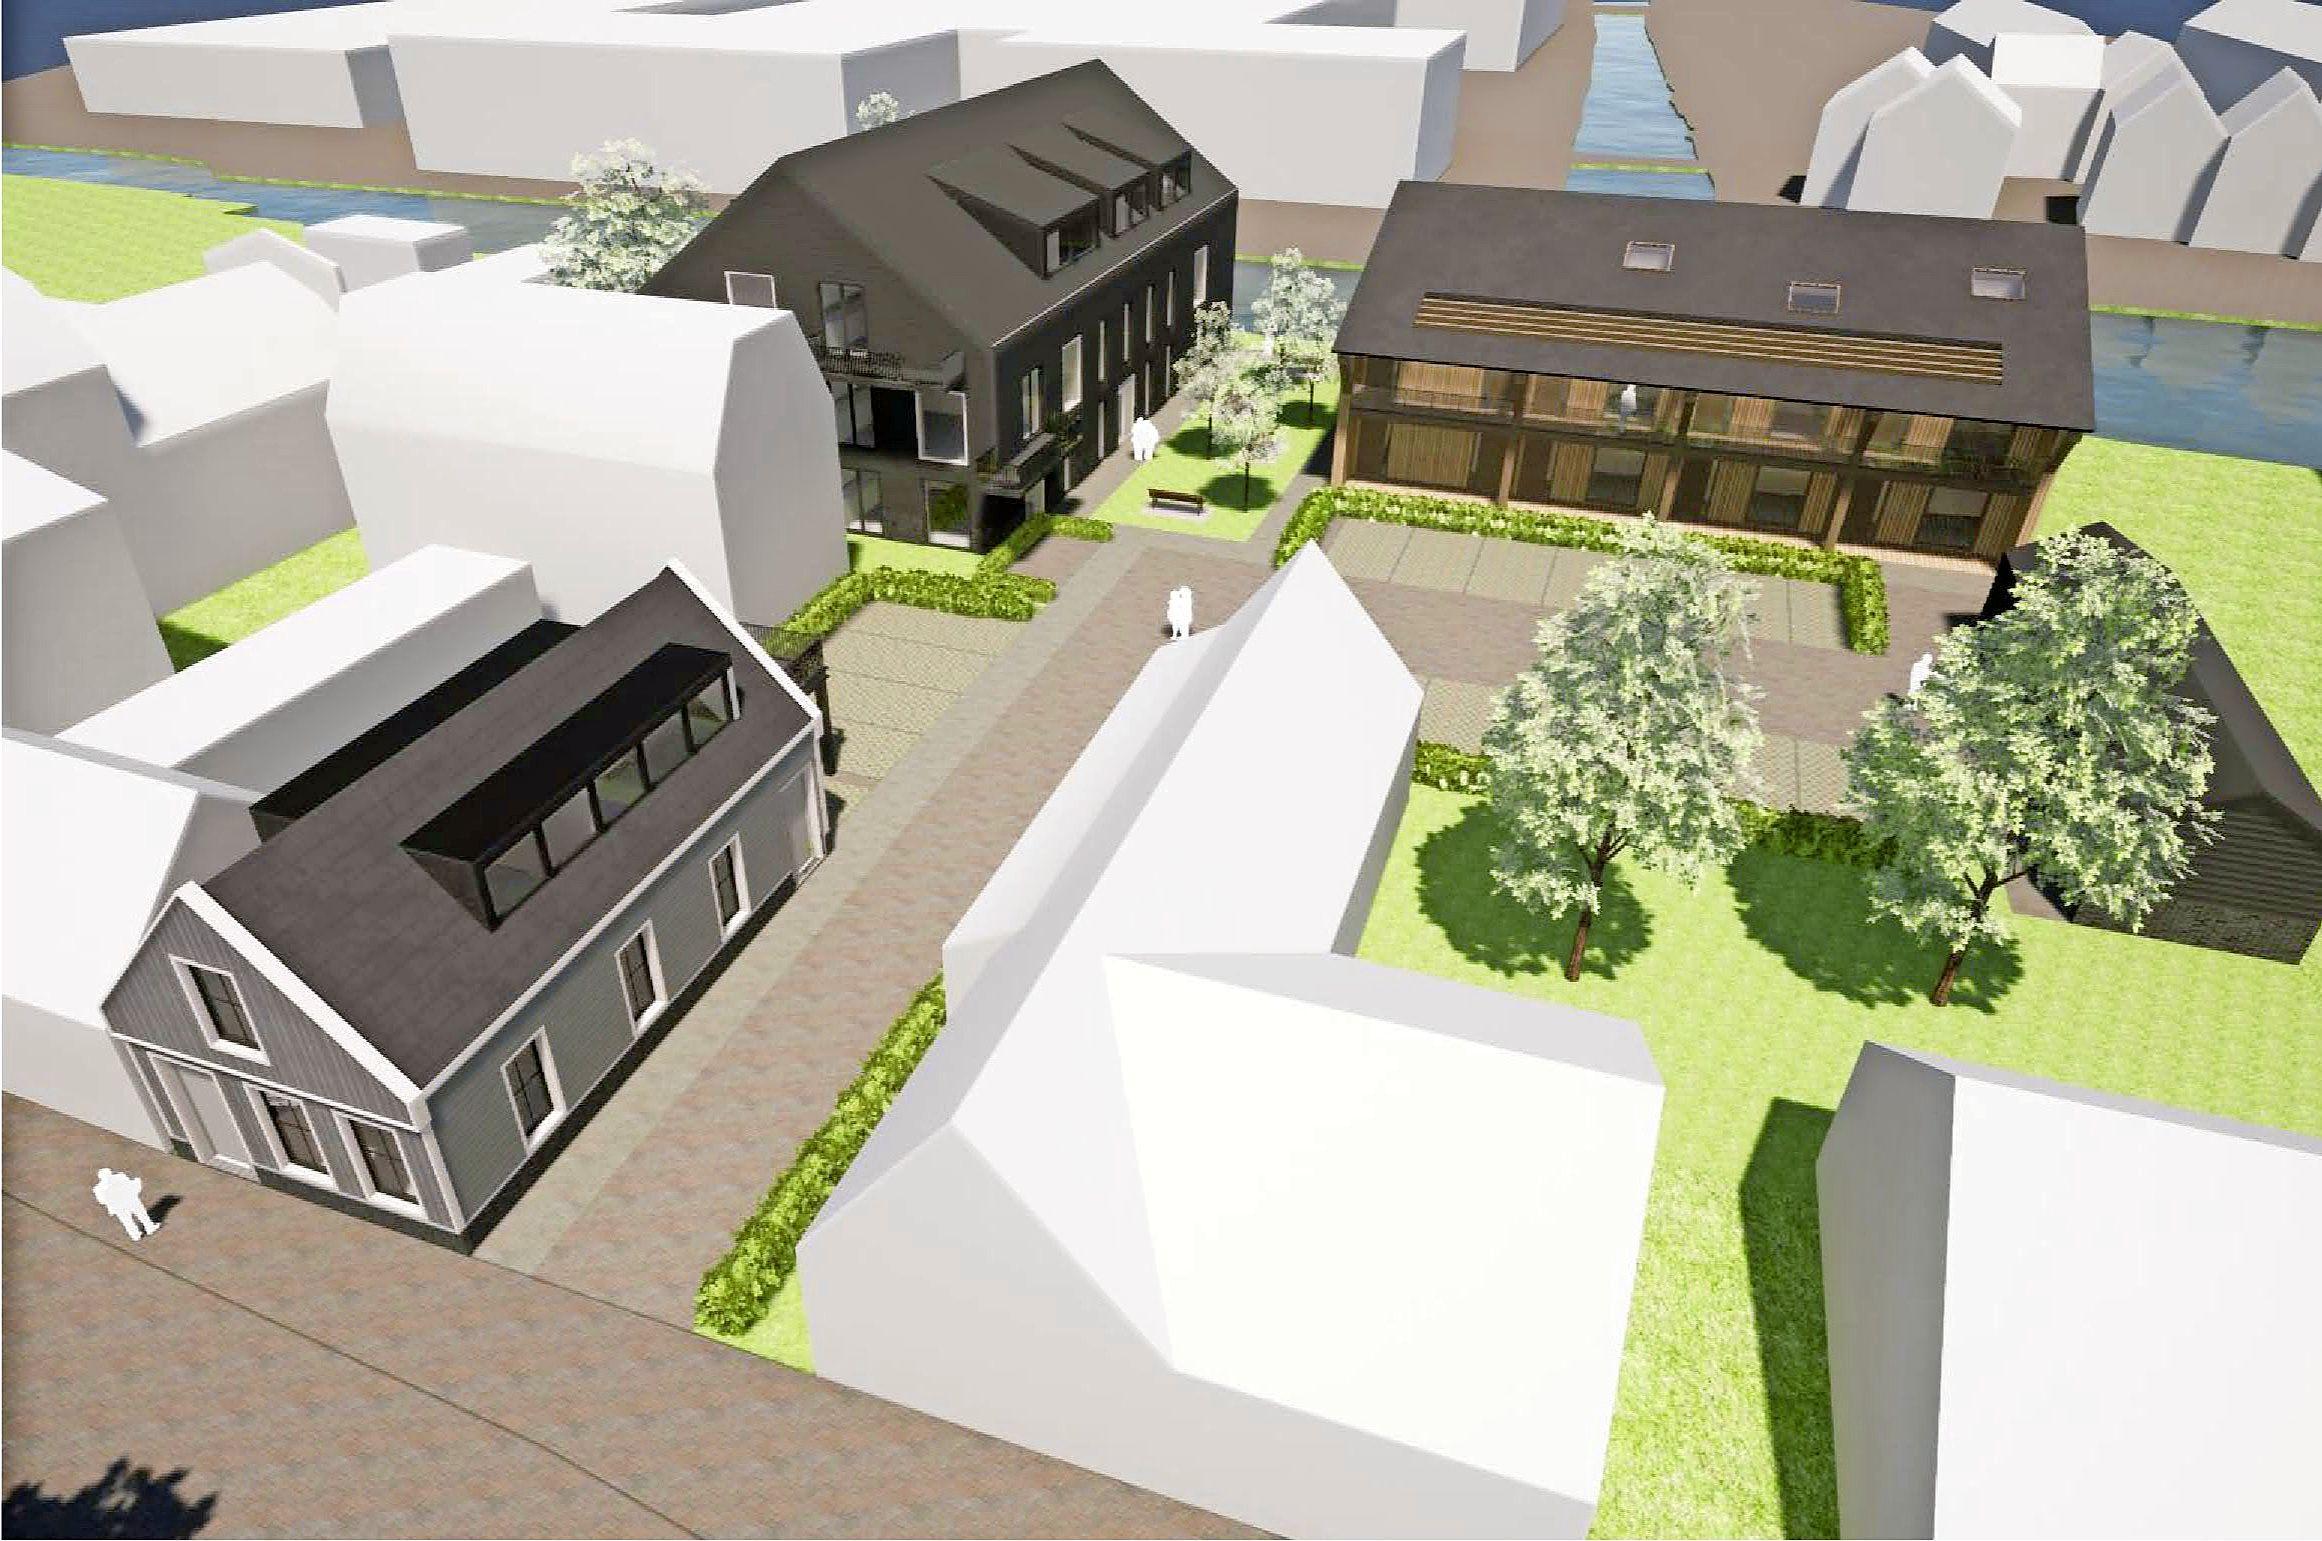 'Getrapte weeg': TBP bouwt levensloopbestendig wooncomplex aan Noorderhoofdstraat in Krommenie